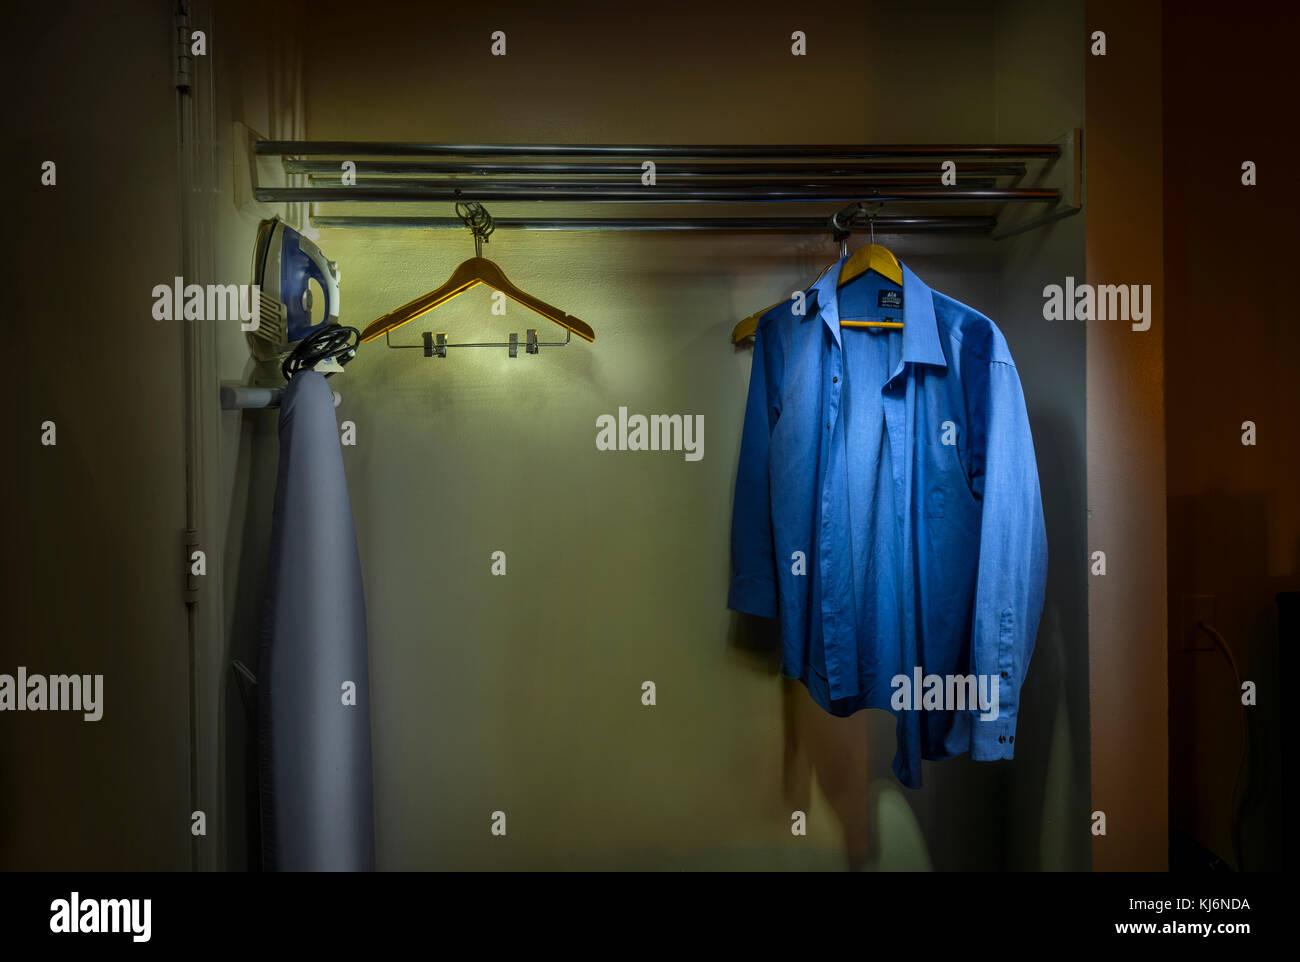 Blue Shirt Hanging In Motel Closet - Stock Image